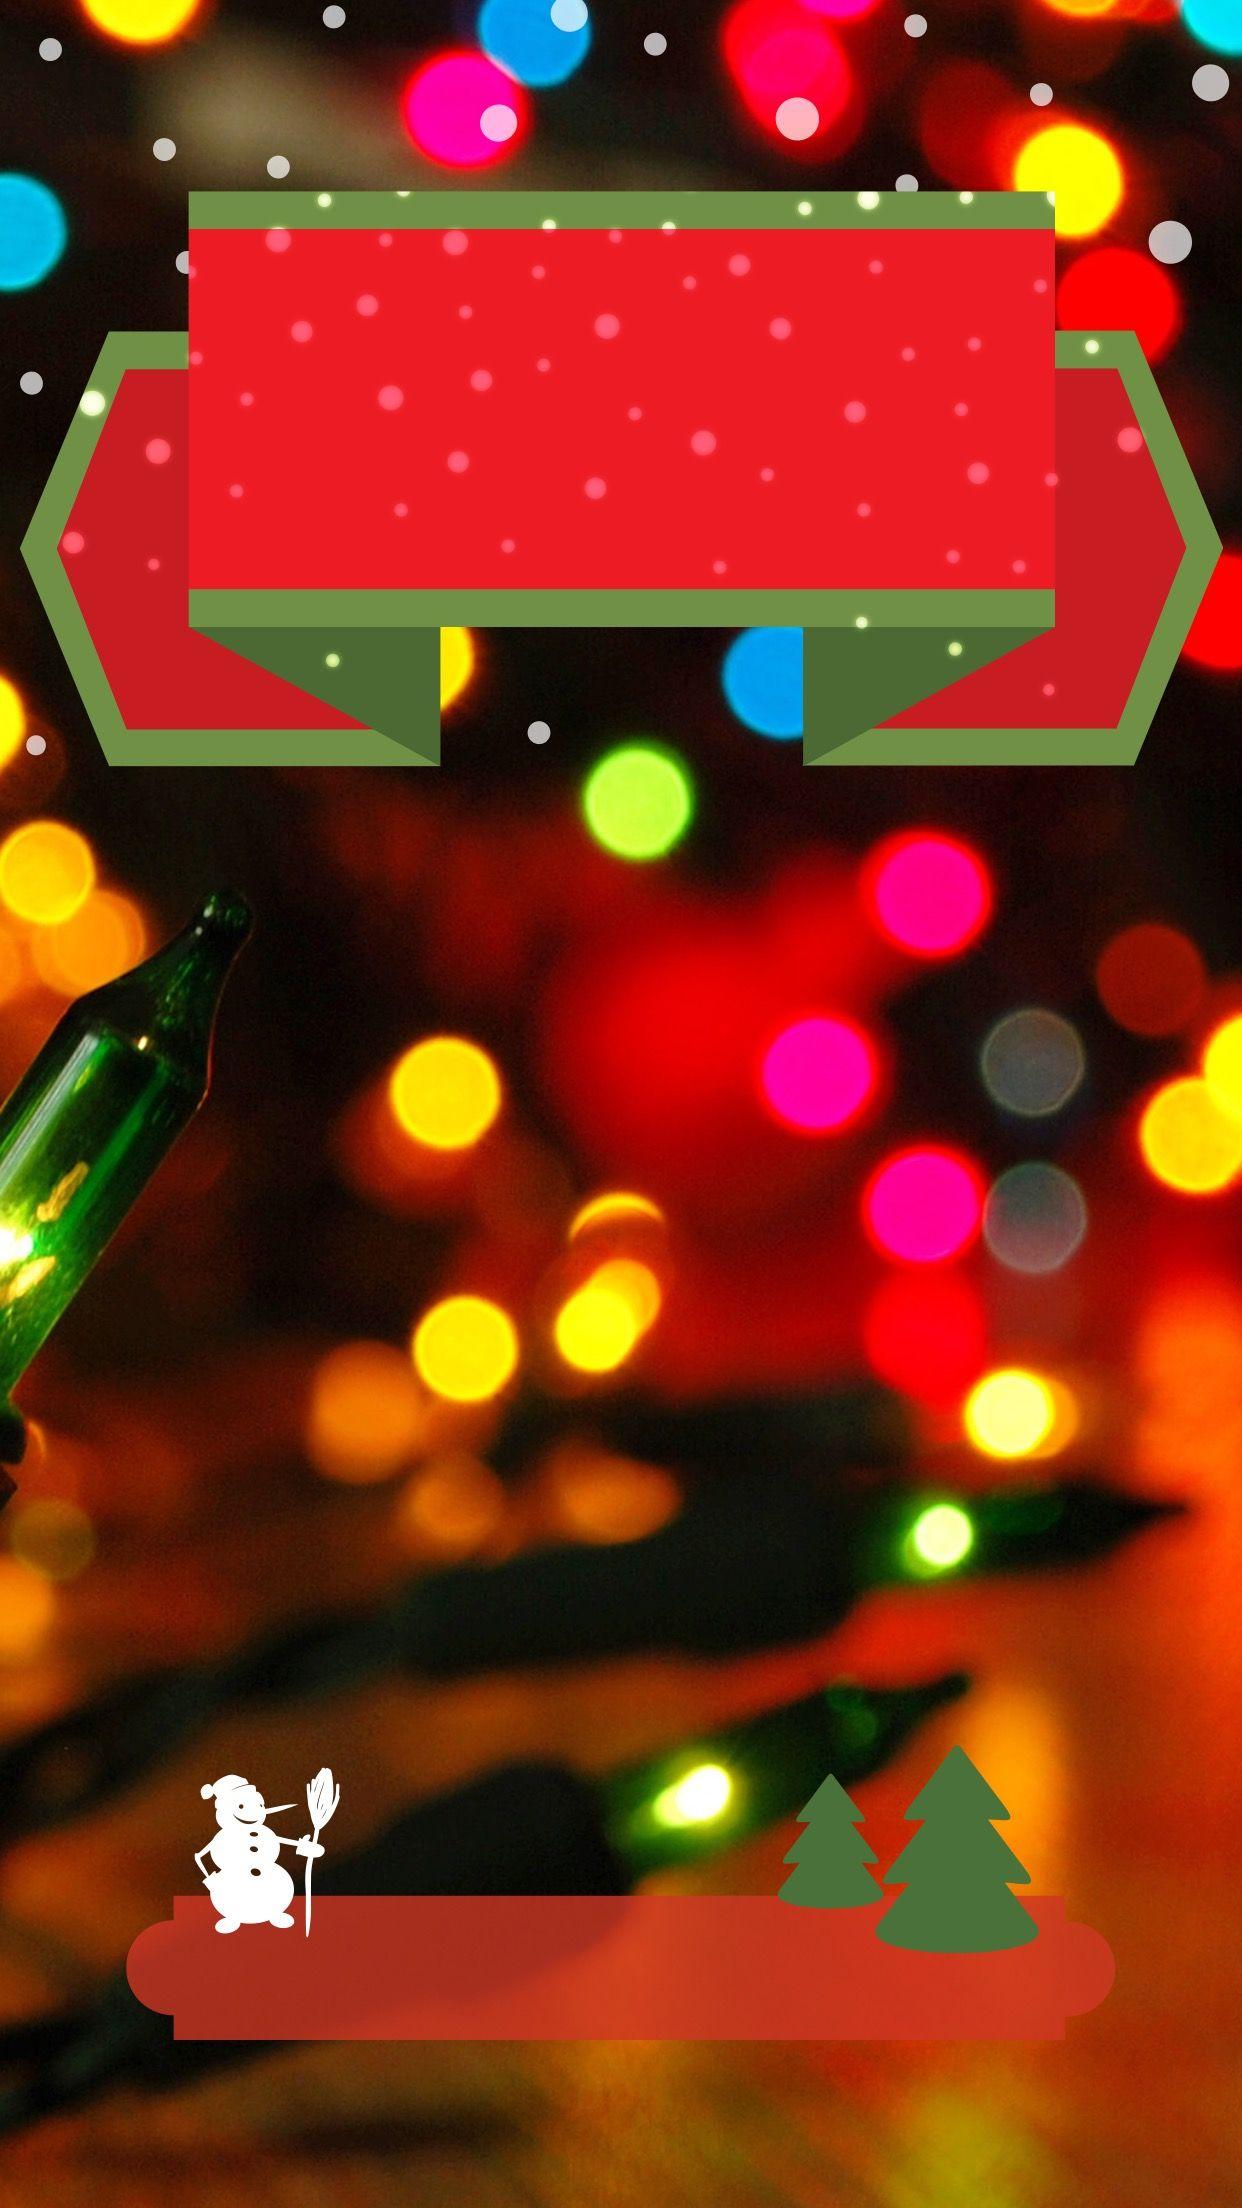 Tap And Get The Free App Lockscreens Art Creative Snow Light Winter Christmas Tree Holiday Hd Ip Christmas Screen Savers Christmas Wallpaper Apple Wallpaper Iphone 6 lock screen iphone 6 christmas